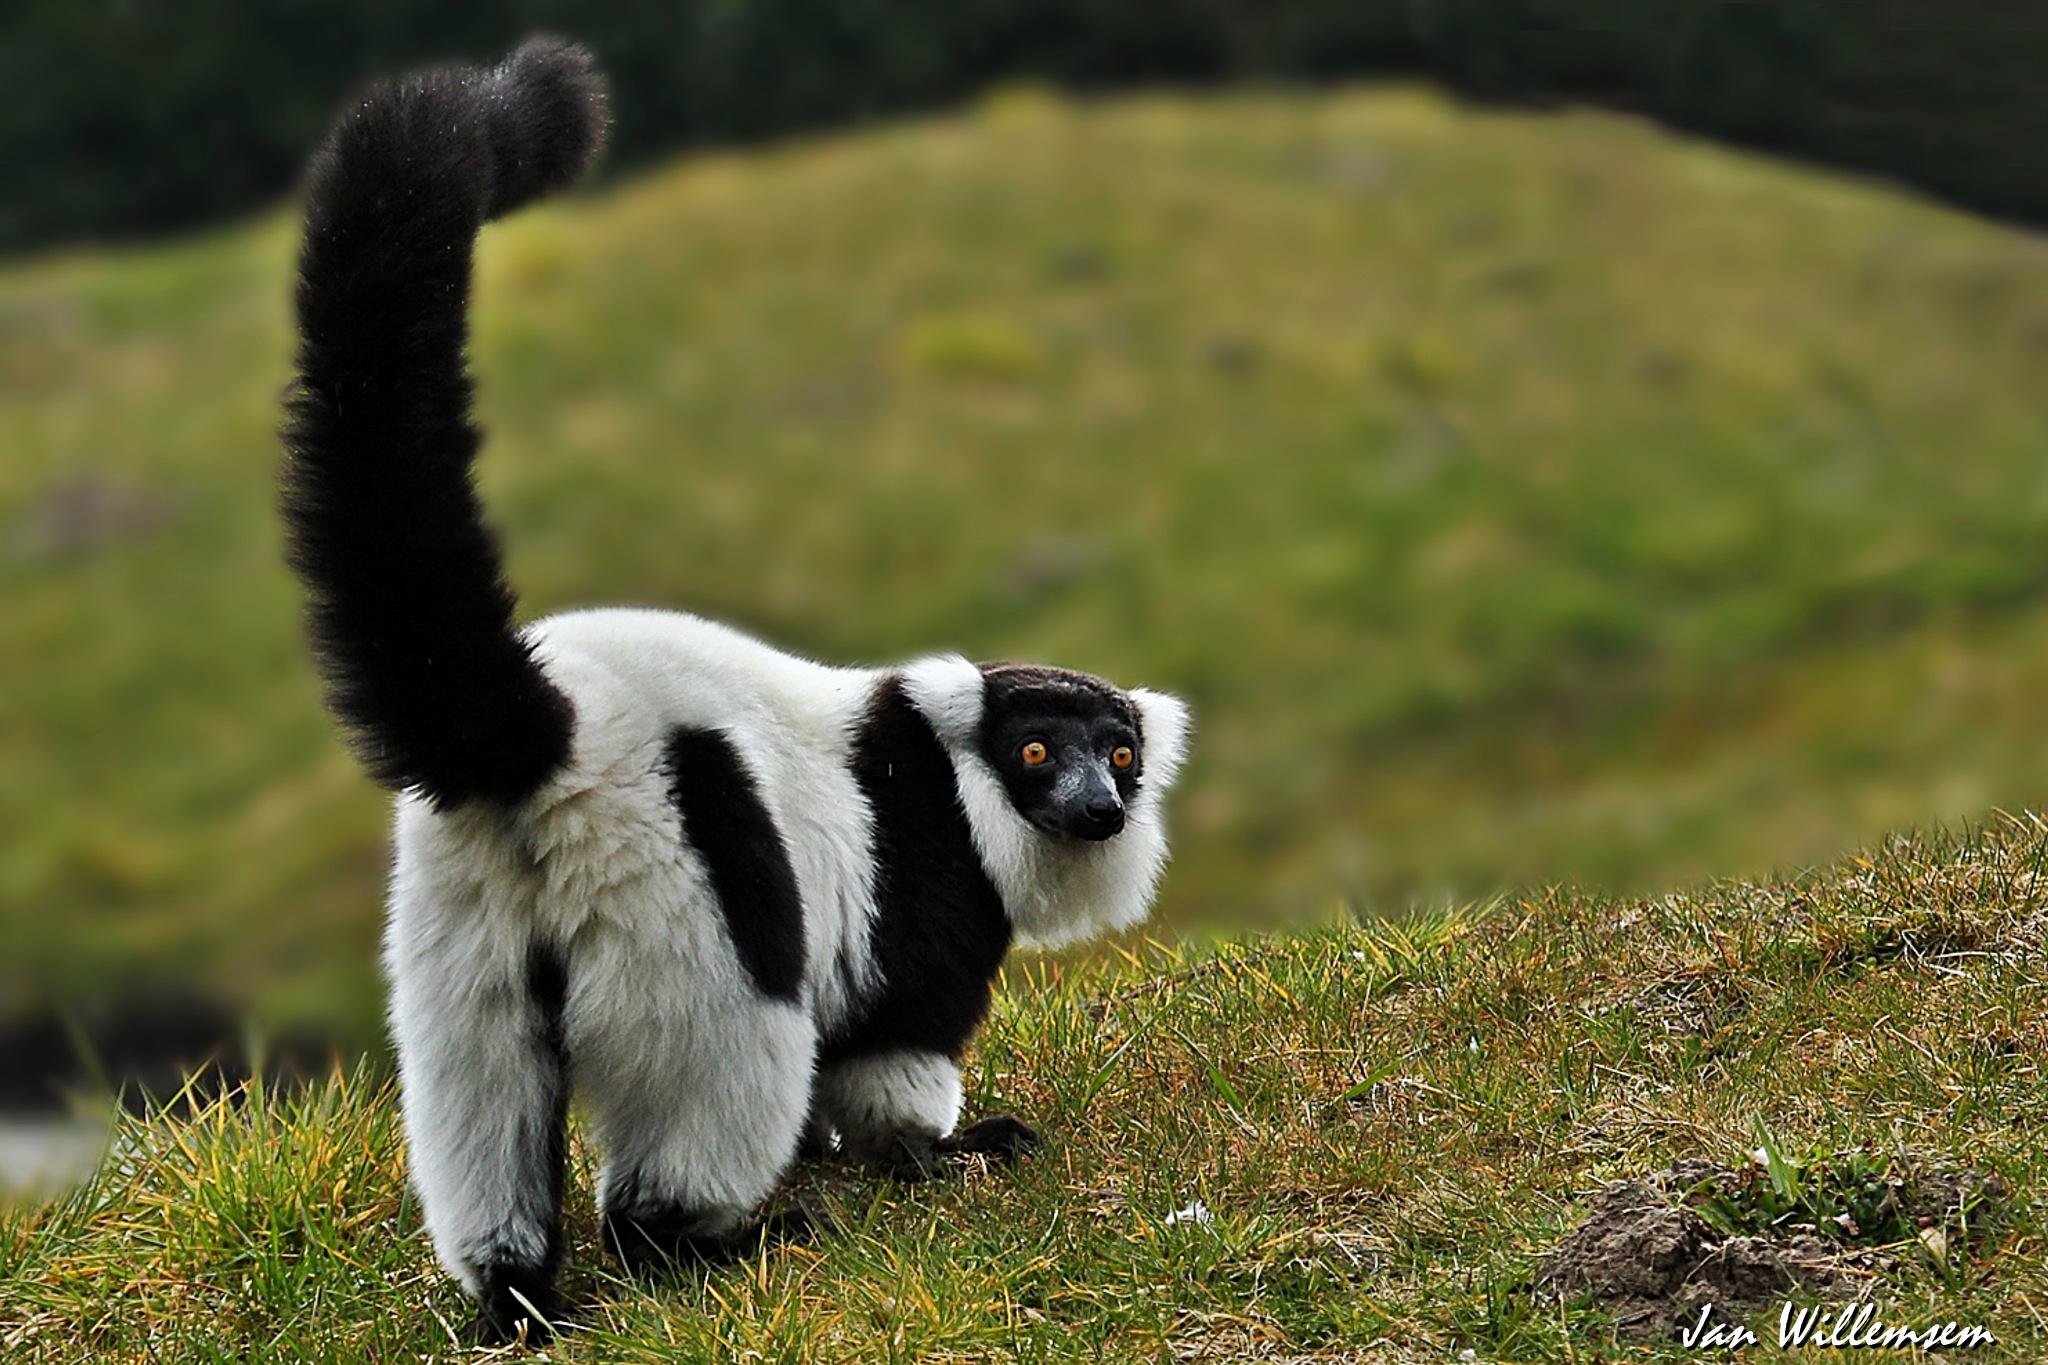 Black and White Ruffed Lemur by Jan Willemsen Fotografie